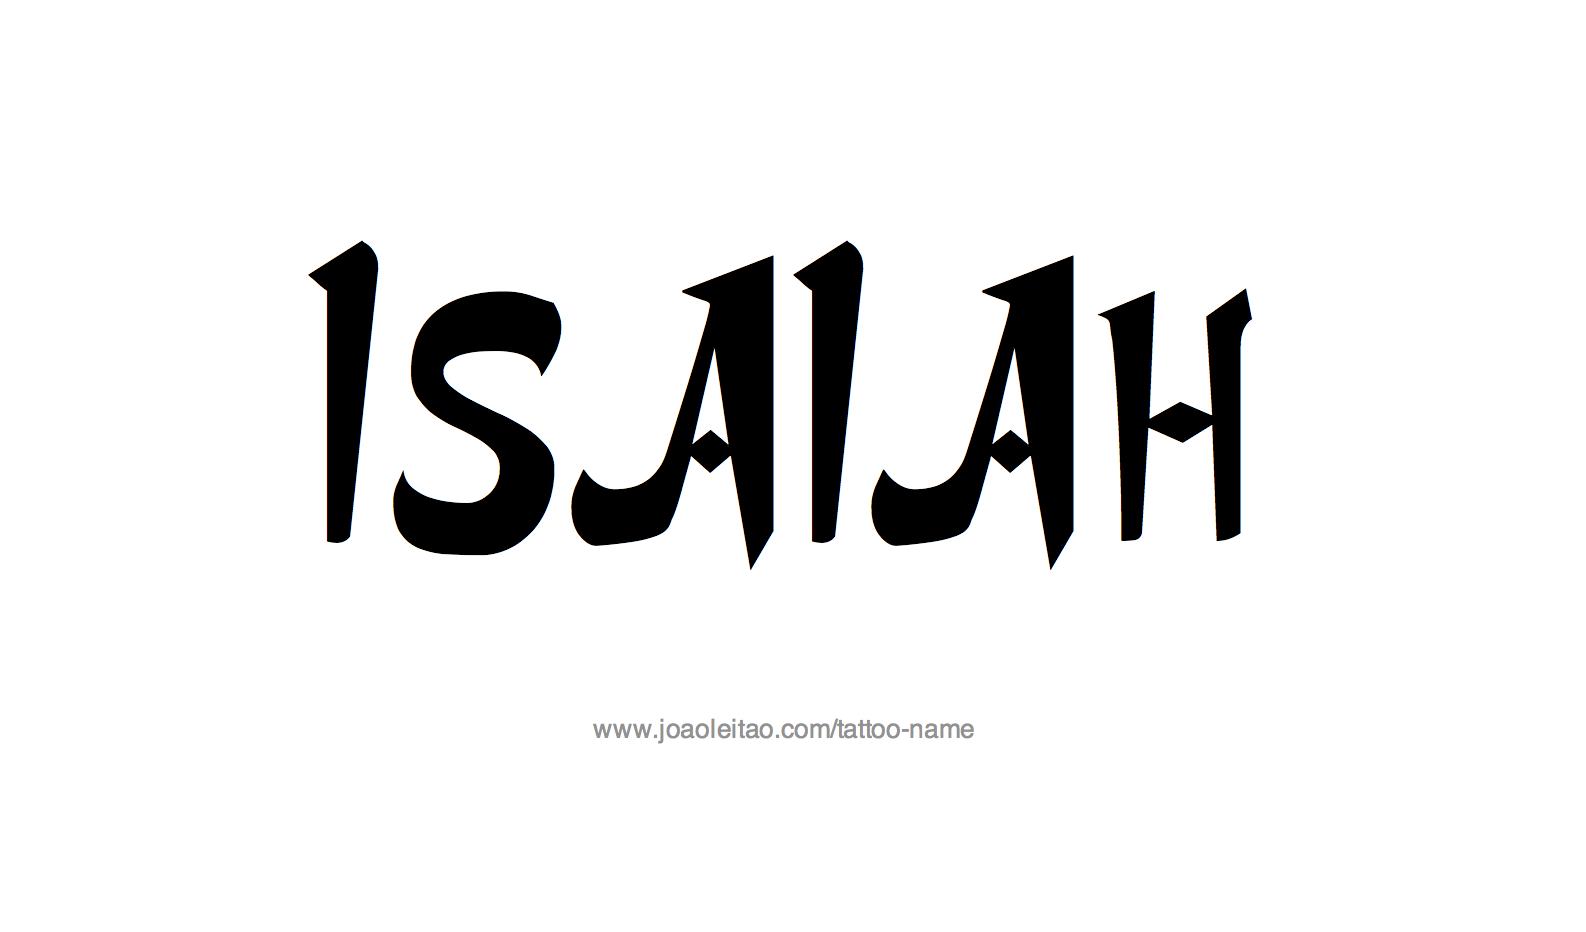 Isaiah Name Tattoo Designs